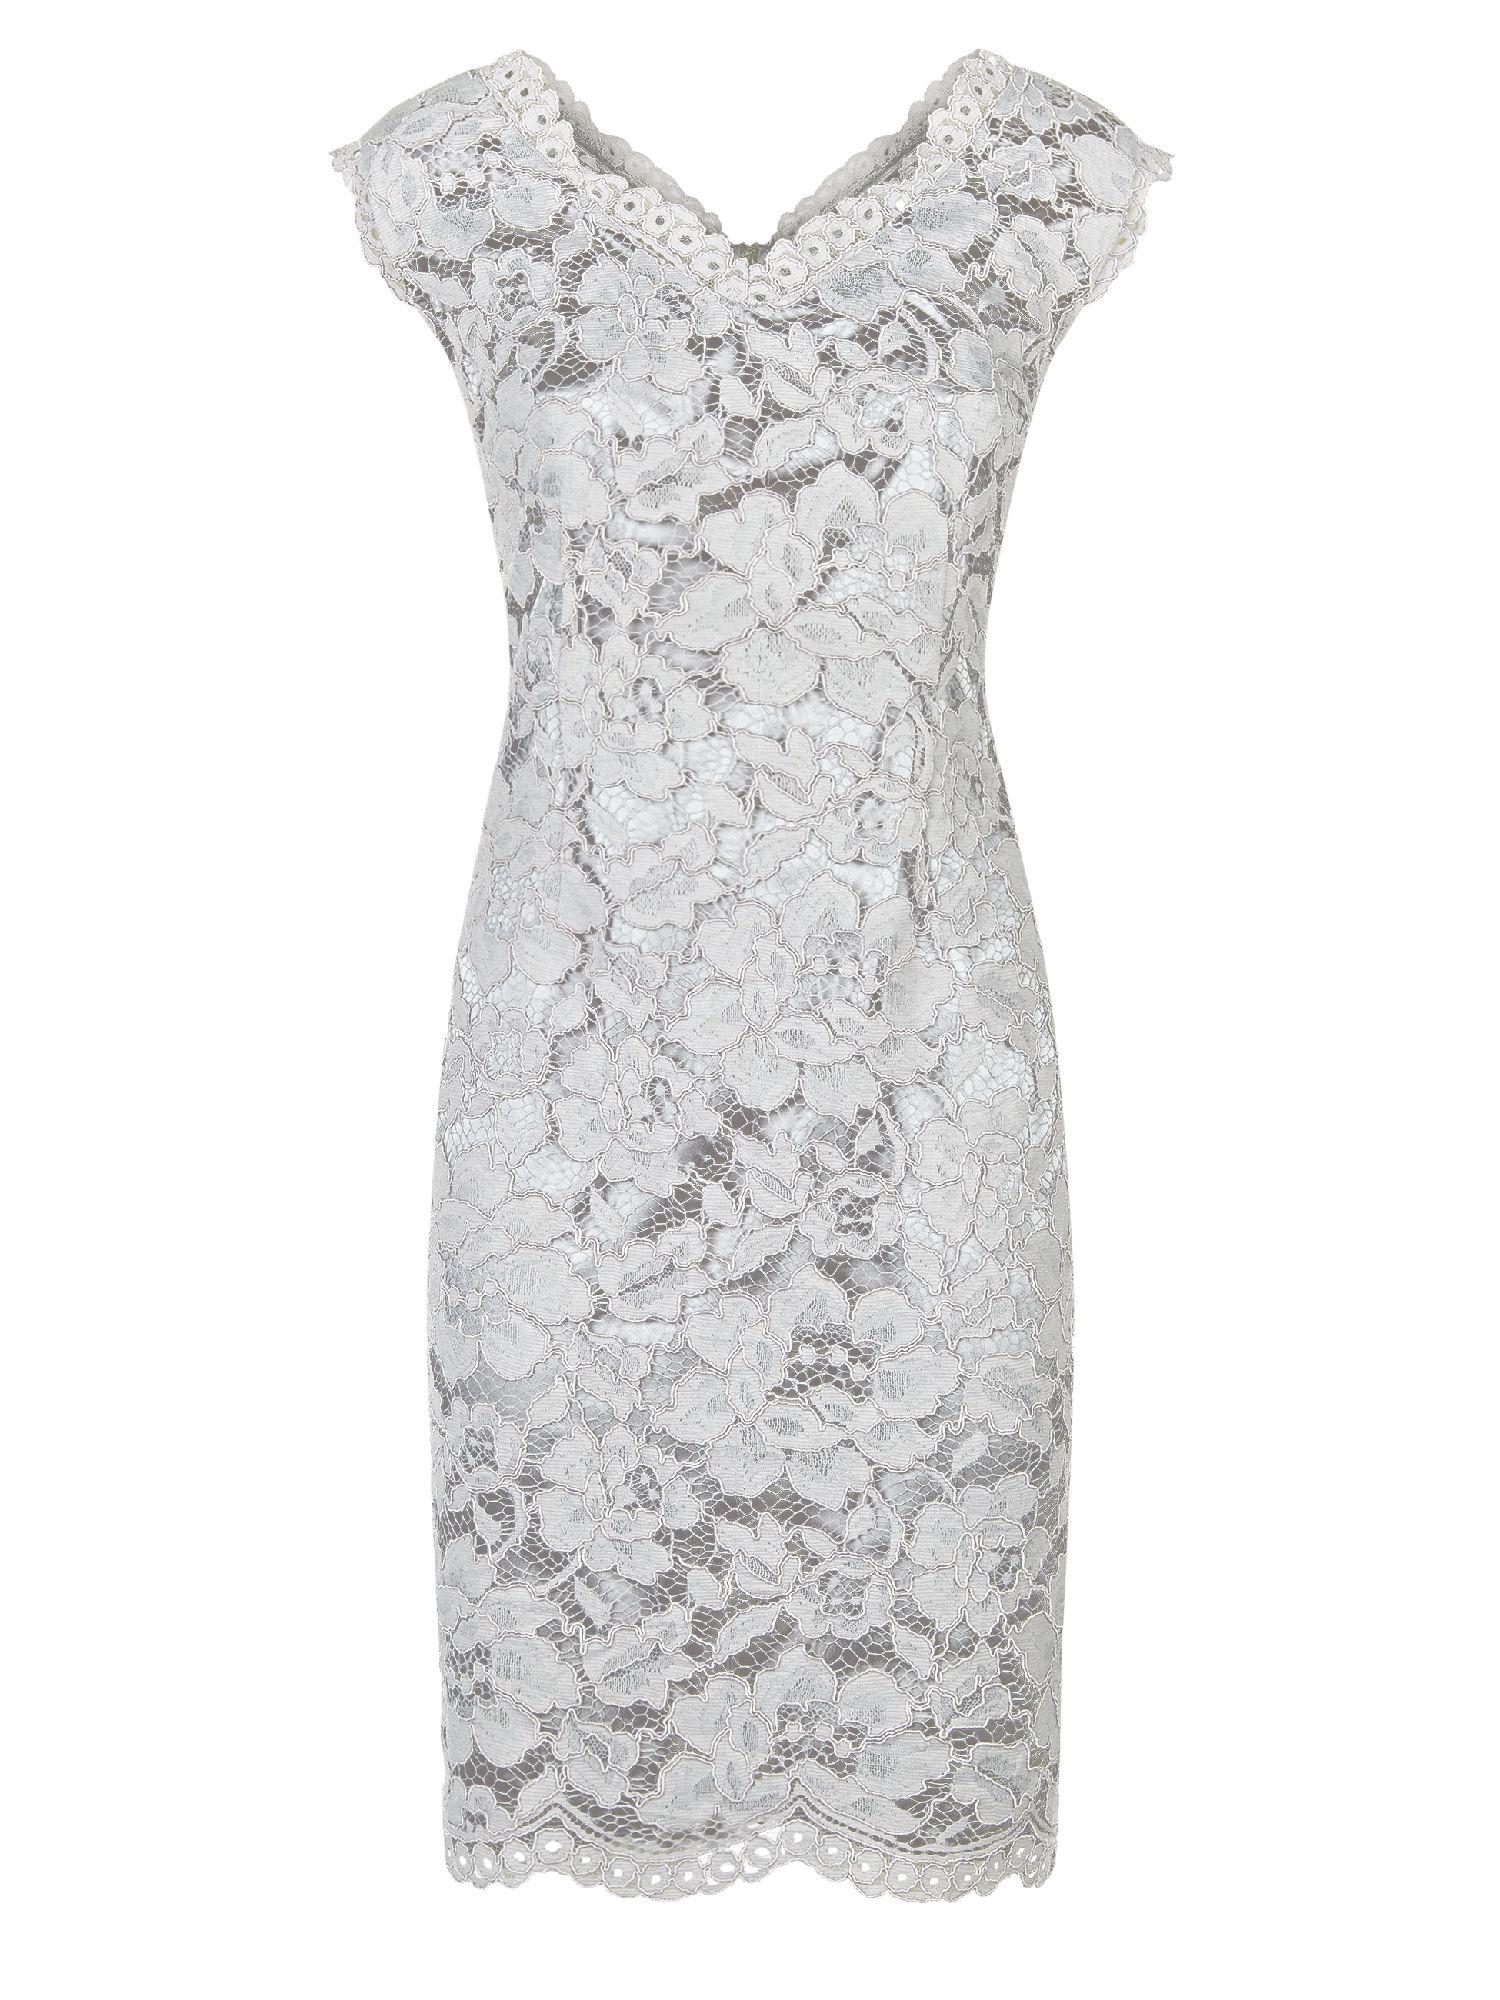 Light grey lace dress